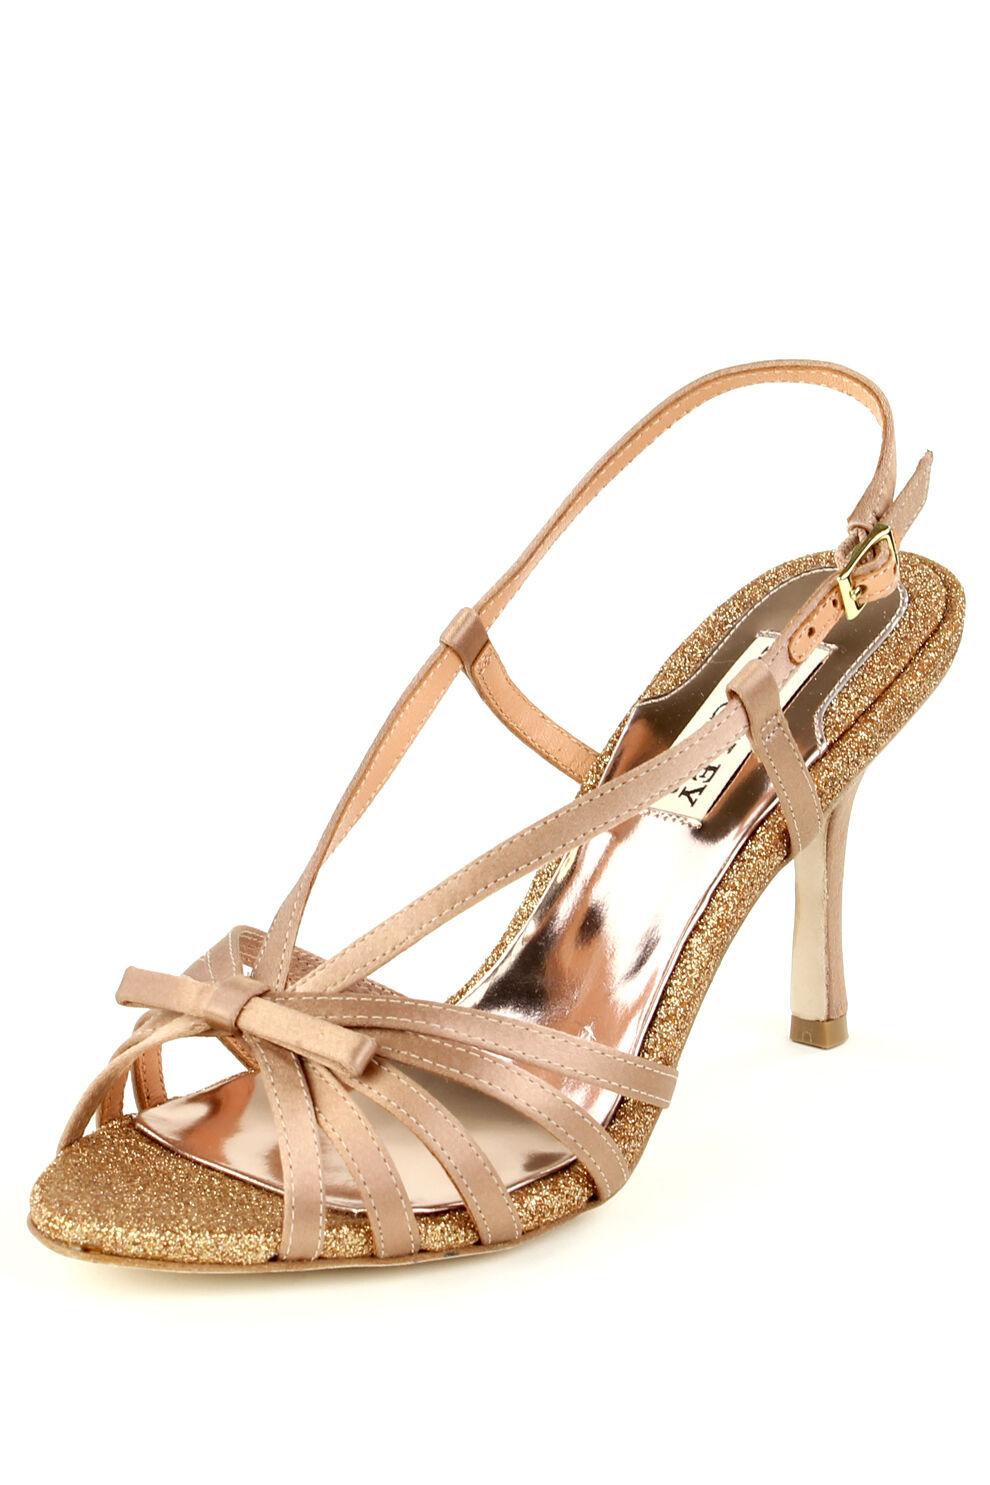 Badgley Mischka WRIGHT Sandals Heels Natural Satin Brand New in Box Retail  175